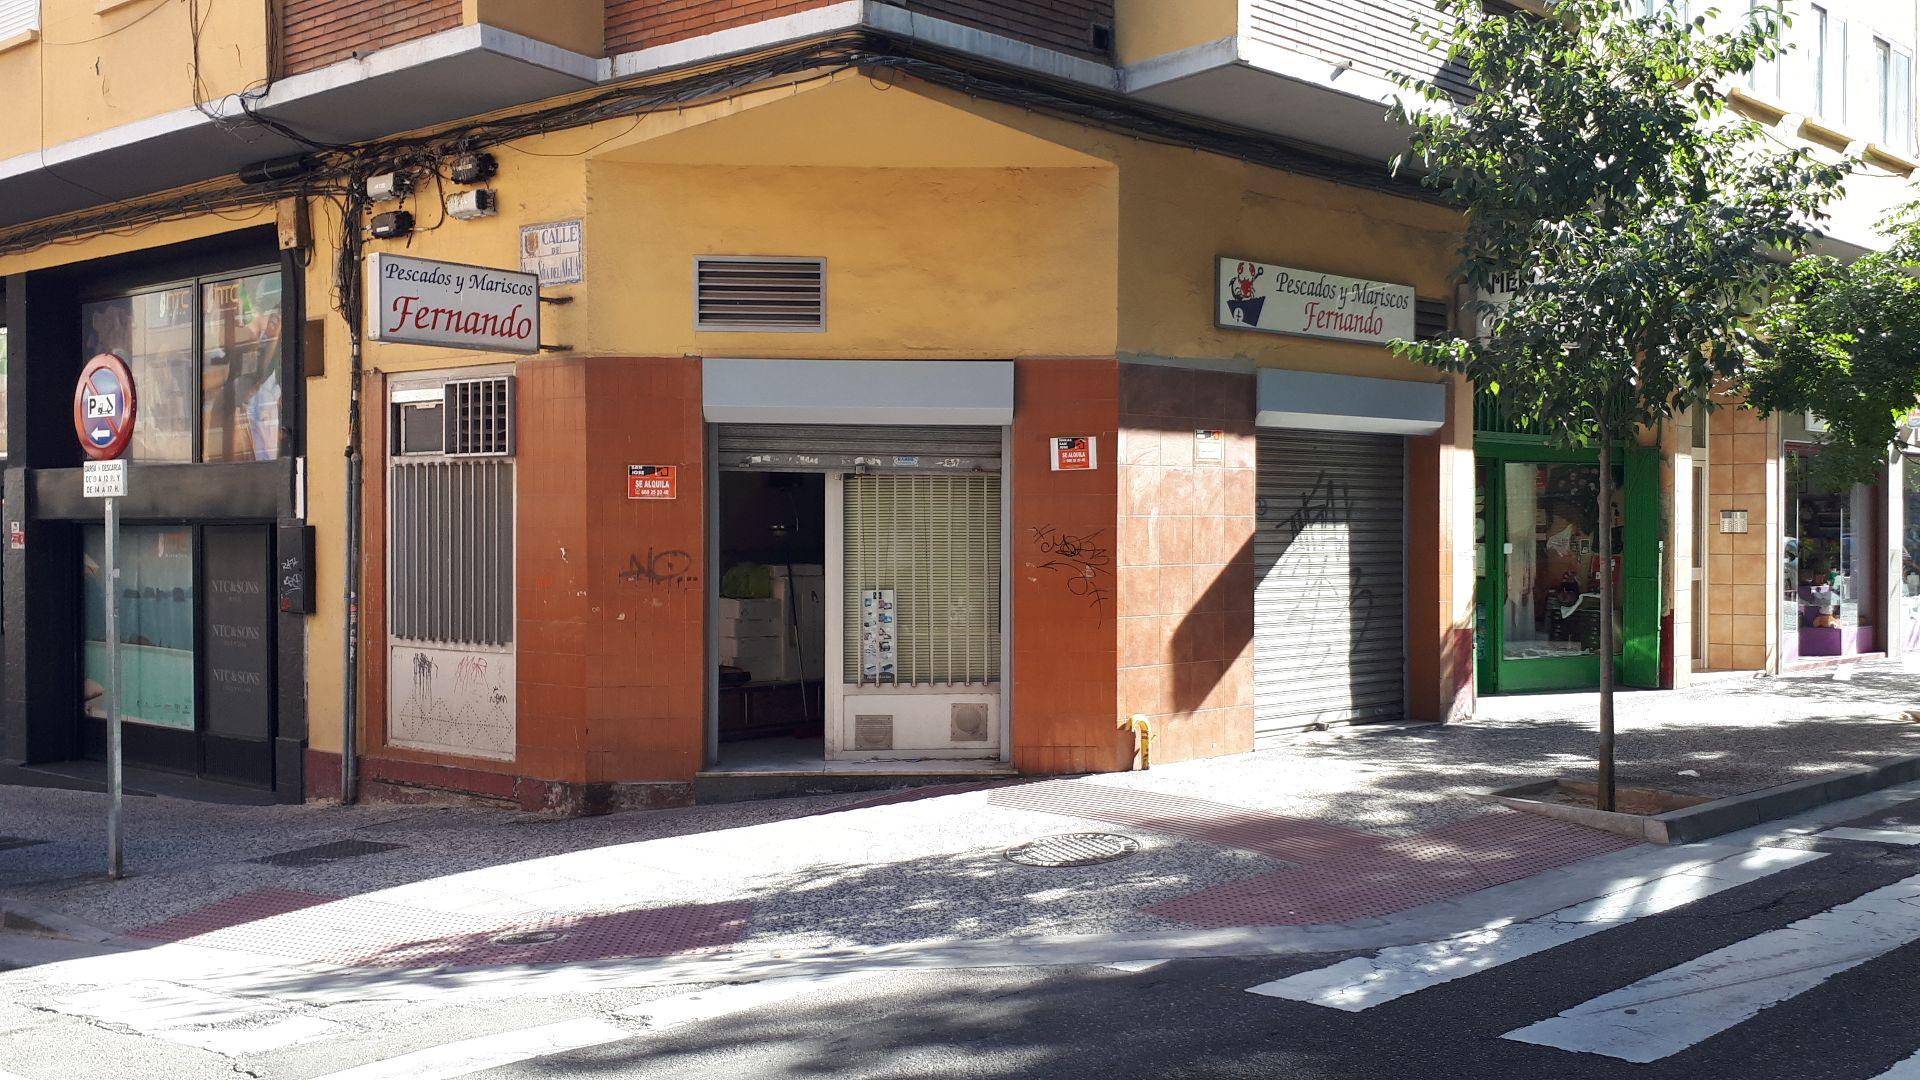 Local comercial en Zaragoza, alquiler